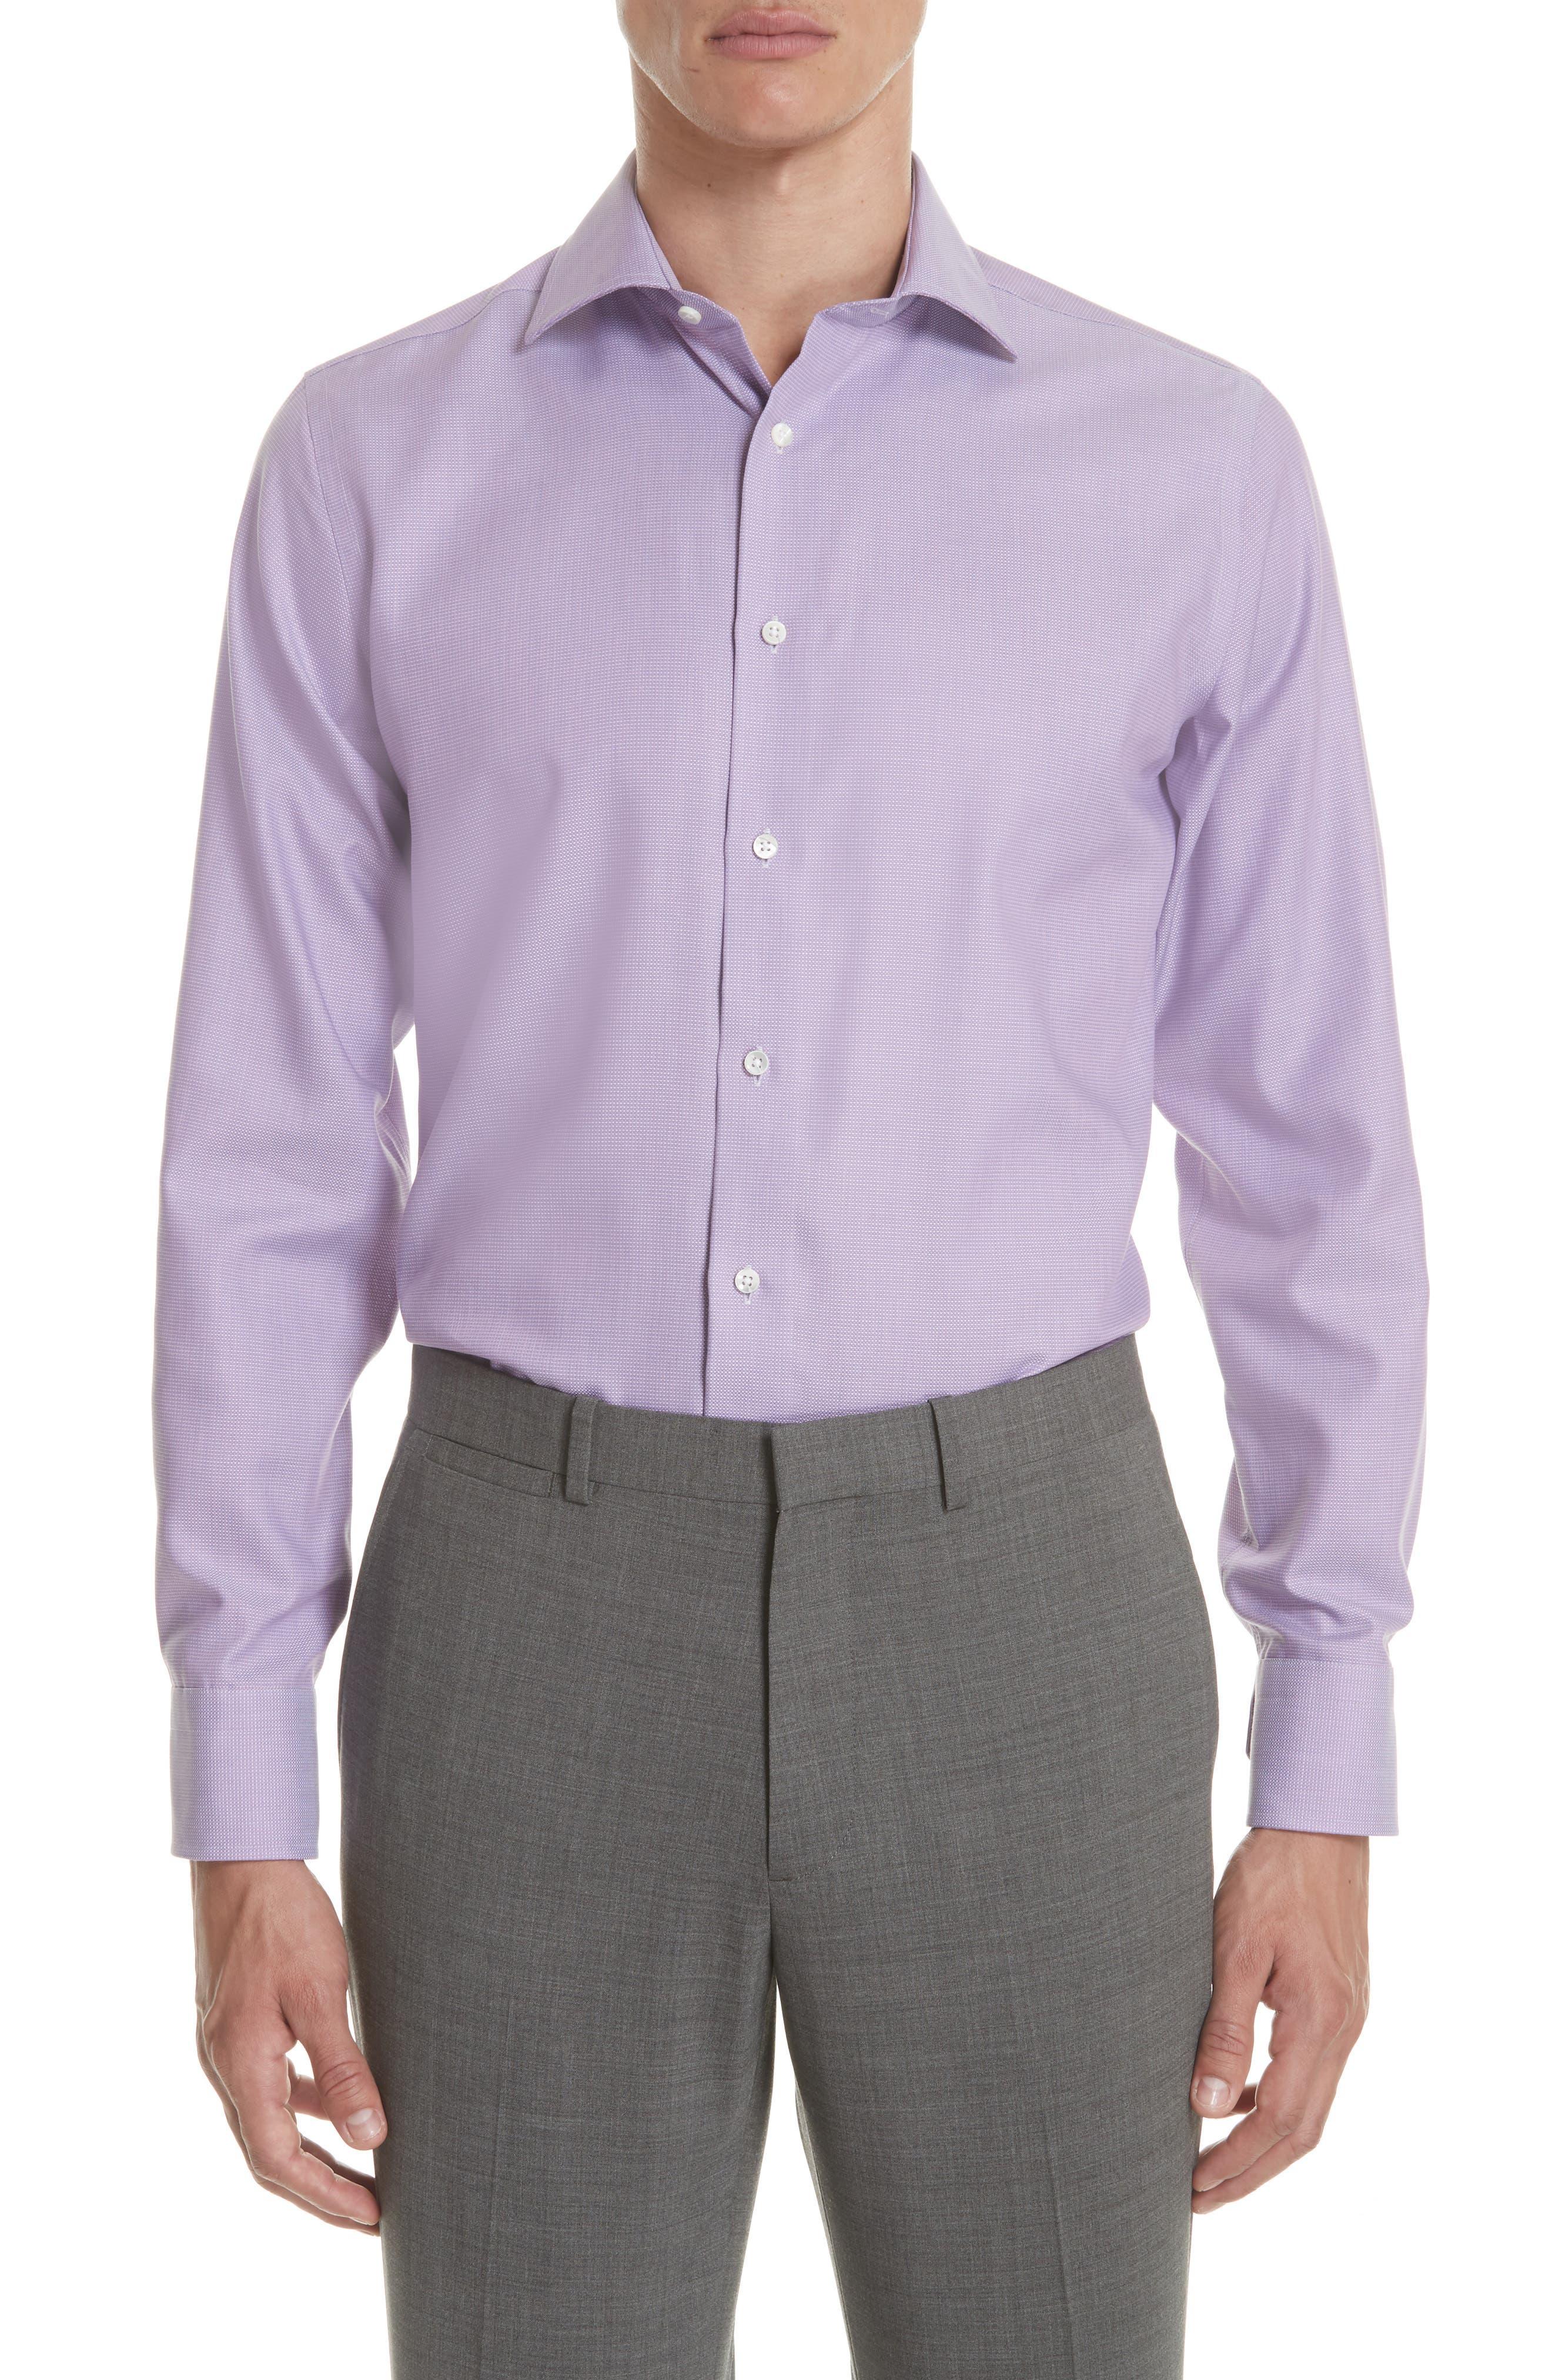 Regular Fit Solid Dress Shirt,                             Main thumbnail 1, color,                             520